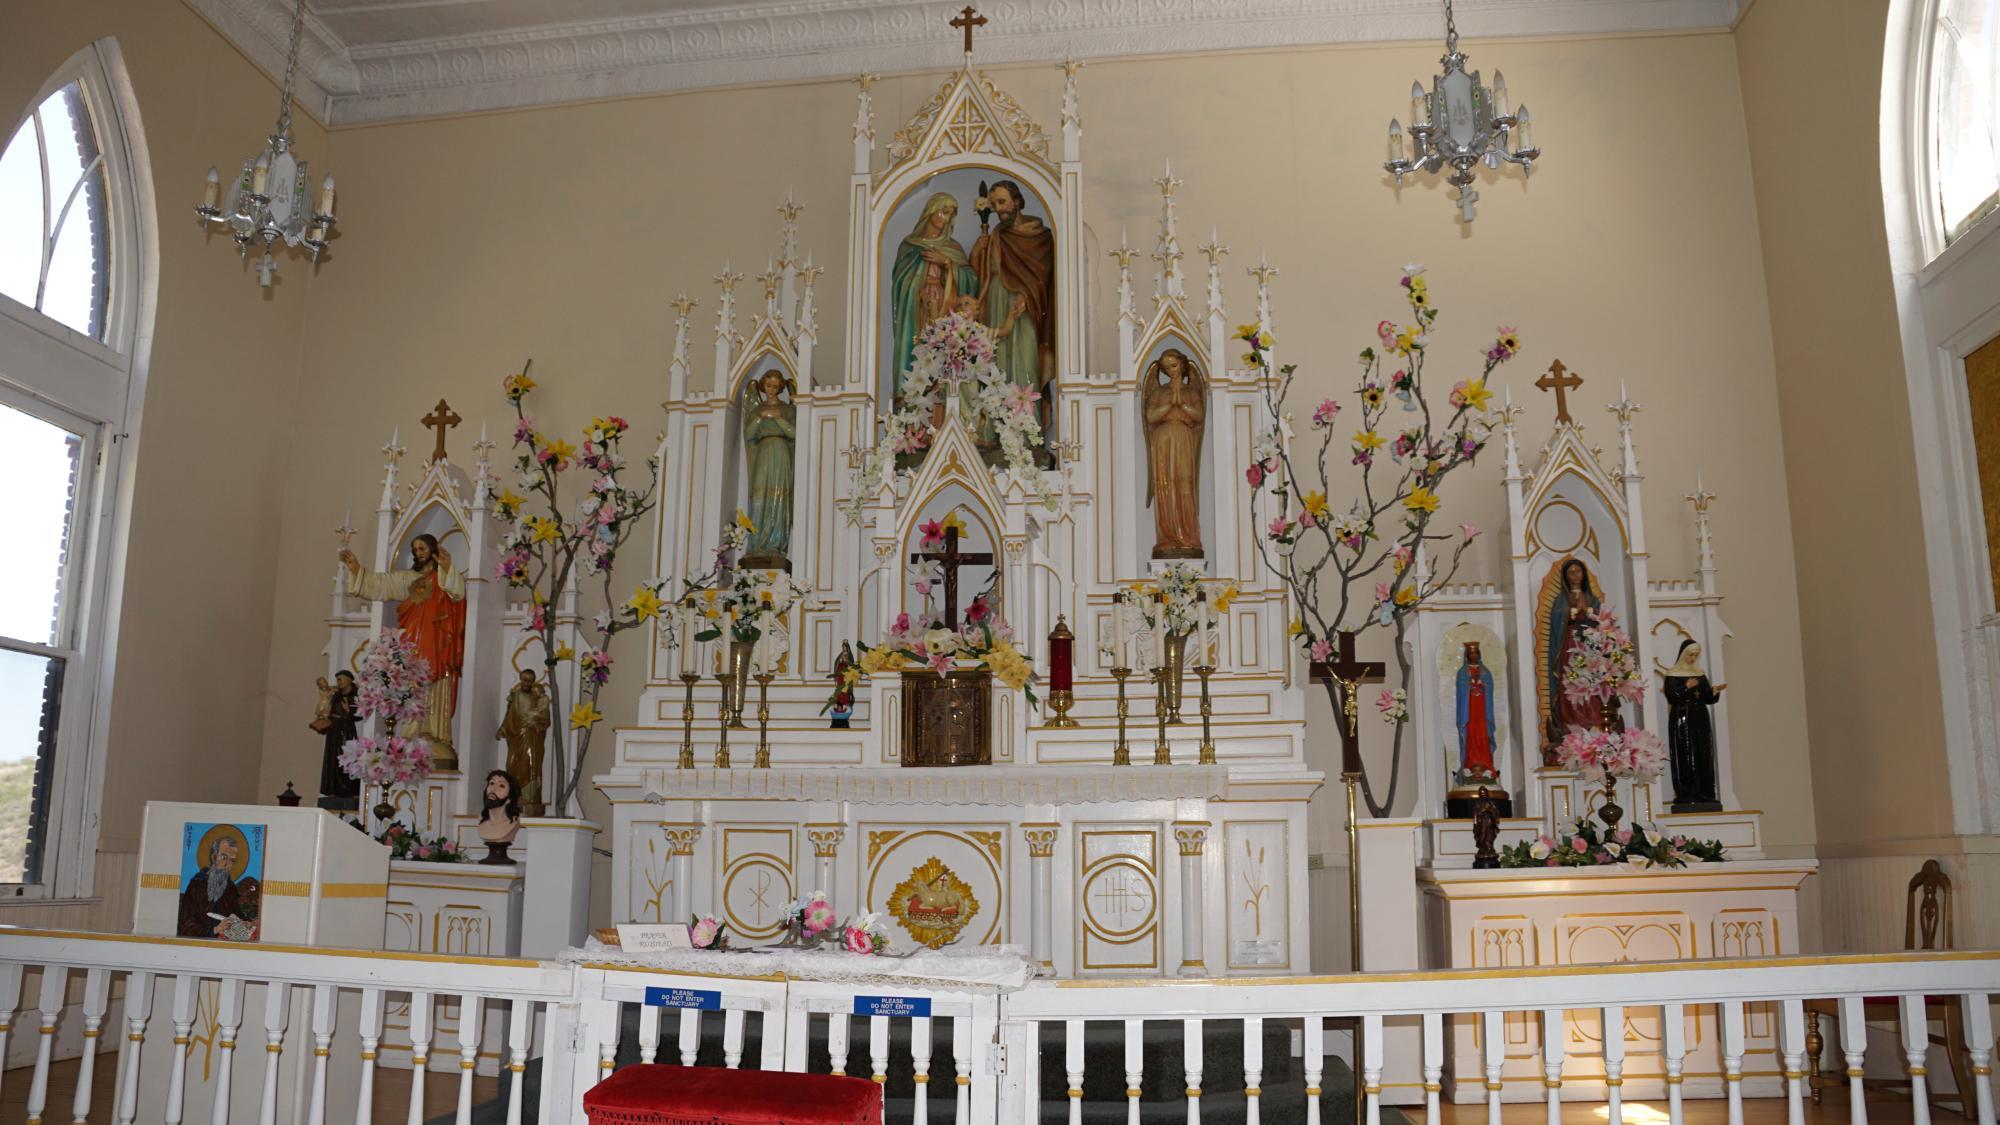 Holy Family Catholic Church, Jerome, AZ